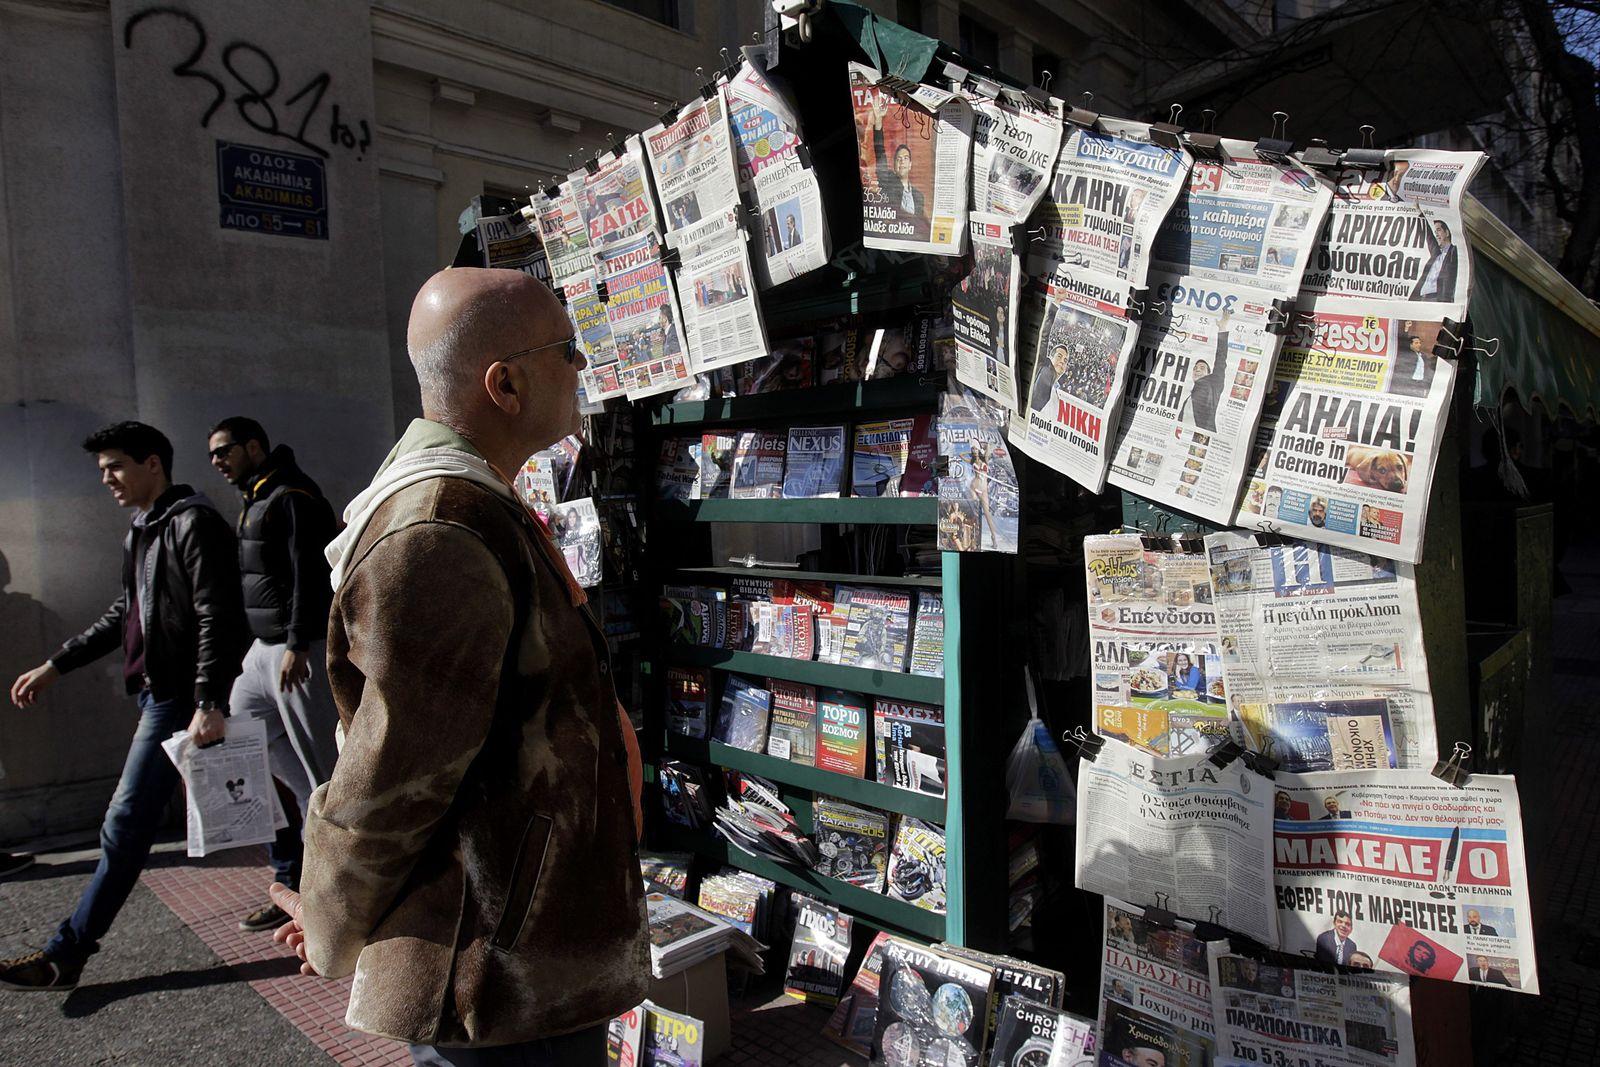 Tsipras/ Medien/ Griechenland/ Zeitung